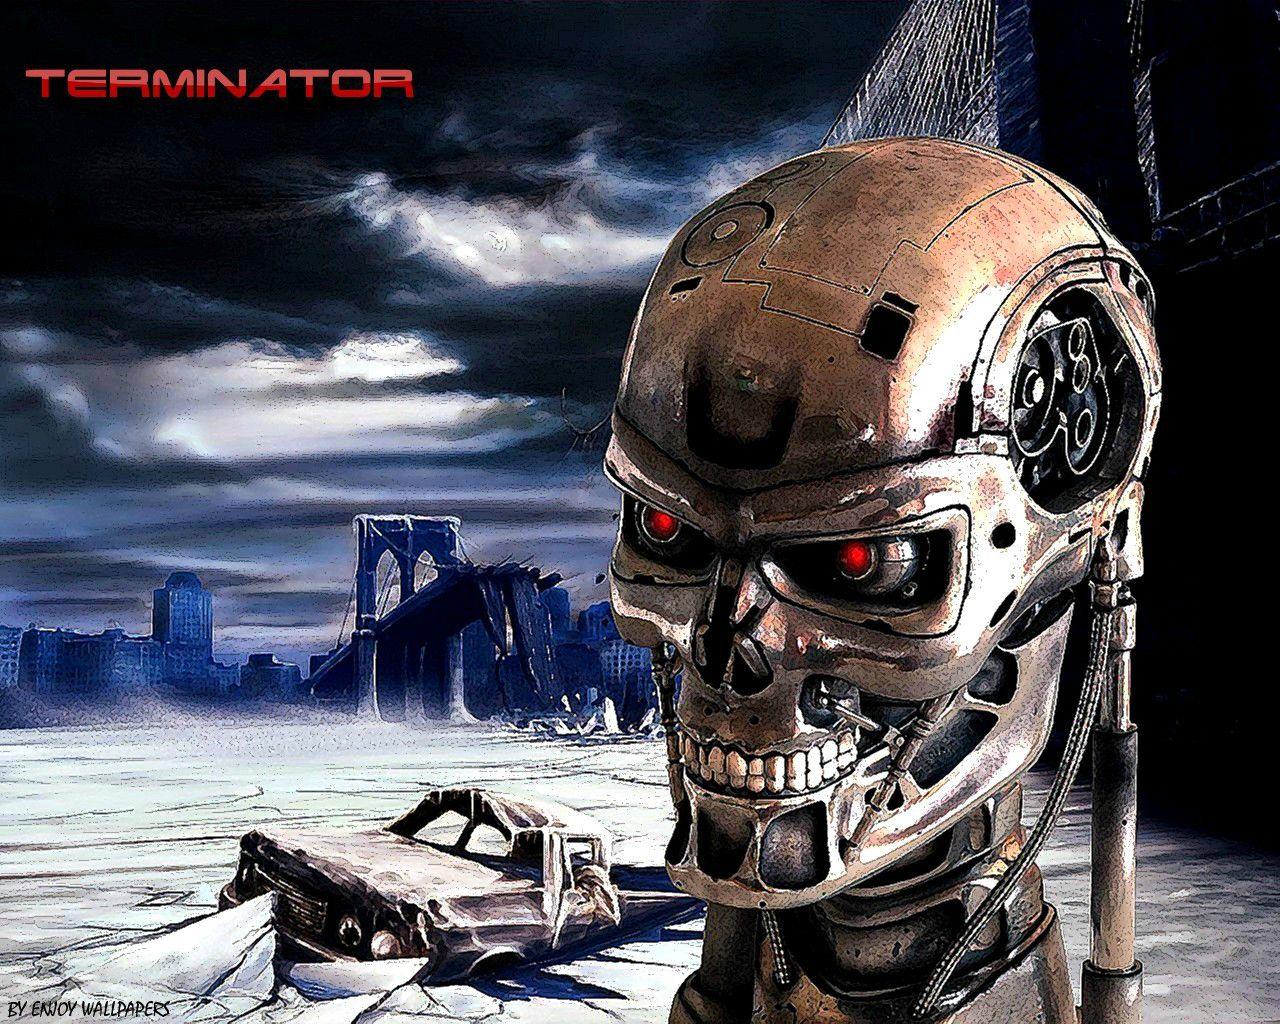 1261095792_Terminator-Creative-Wallpaper-1280x1024-By-Enjoy-Wallpapers-2009